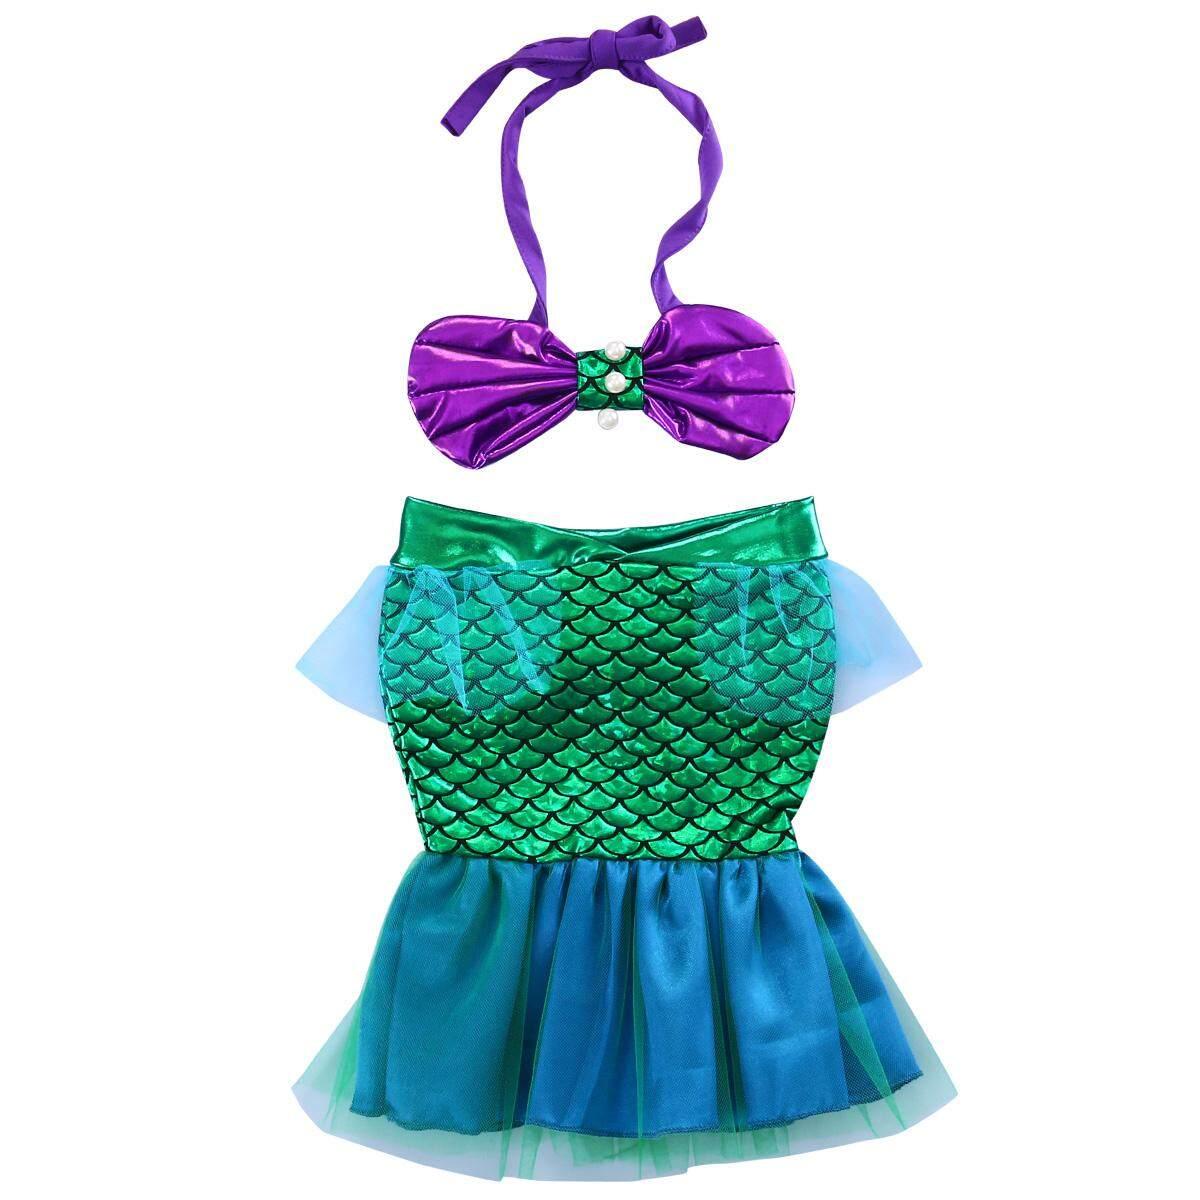 cf0d650a5d Girls Swim Wear for sale - Girls Swimming Wear Online Deals & Prices ...